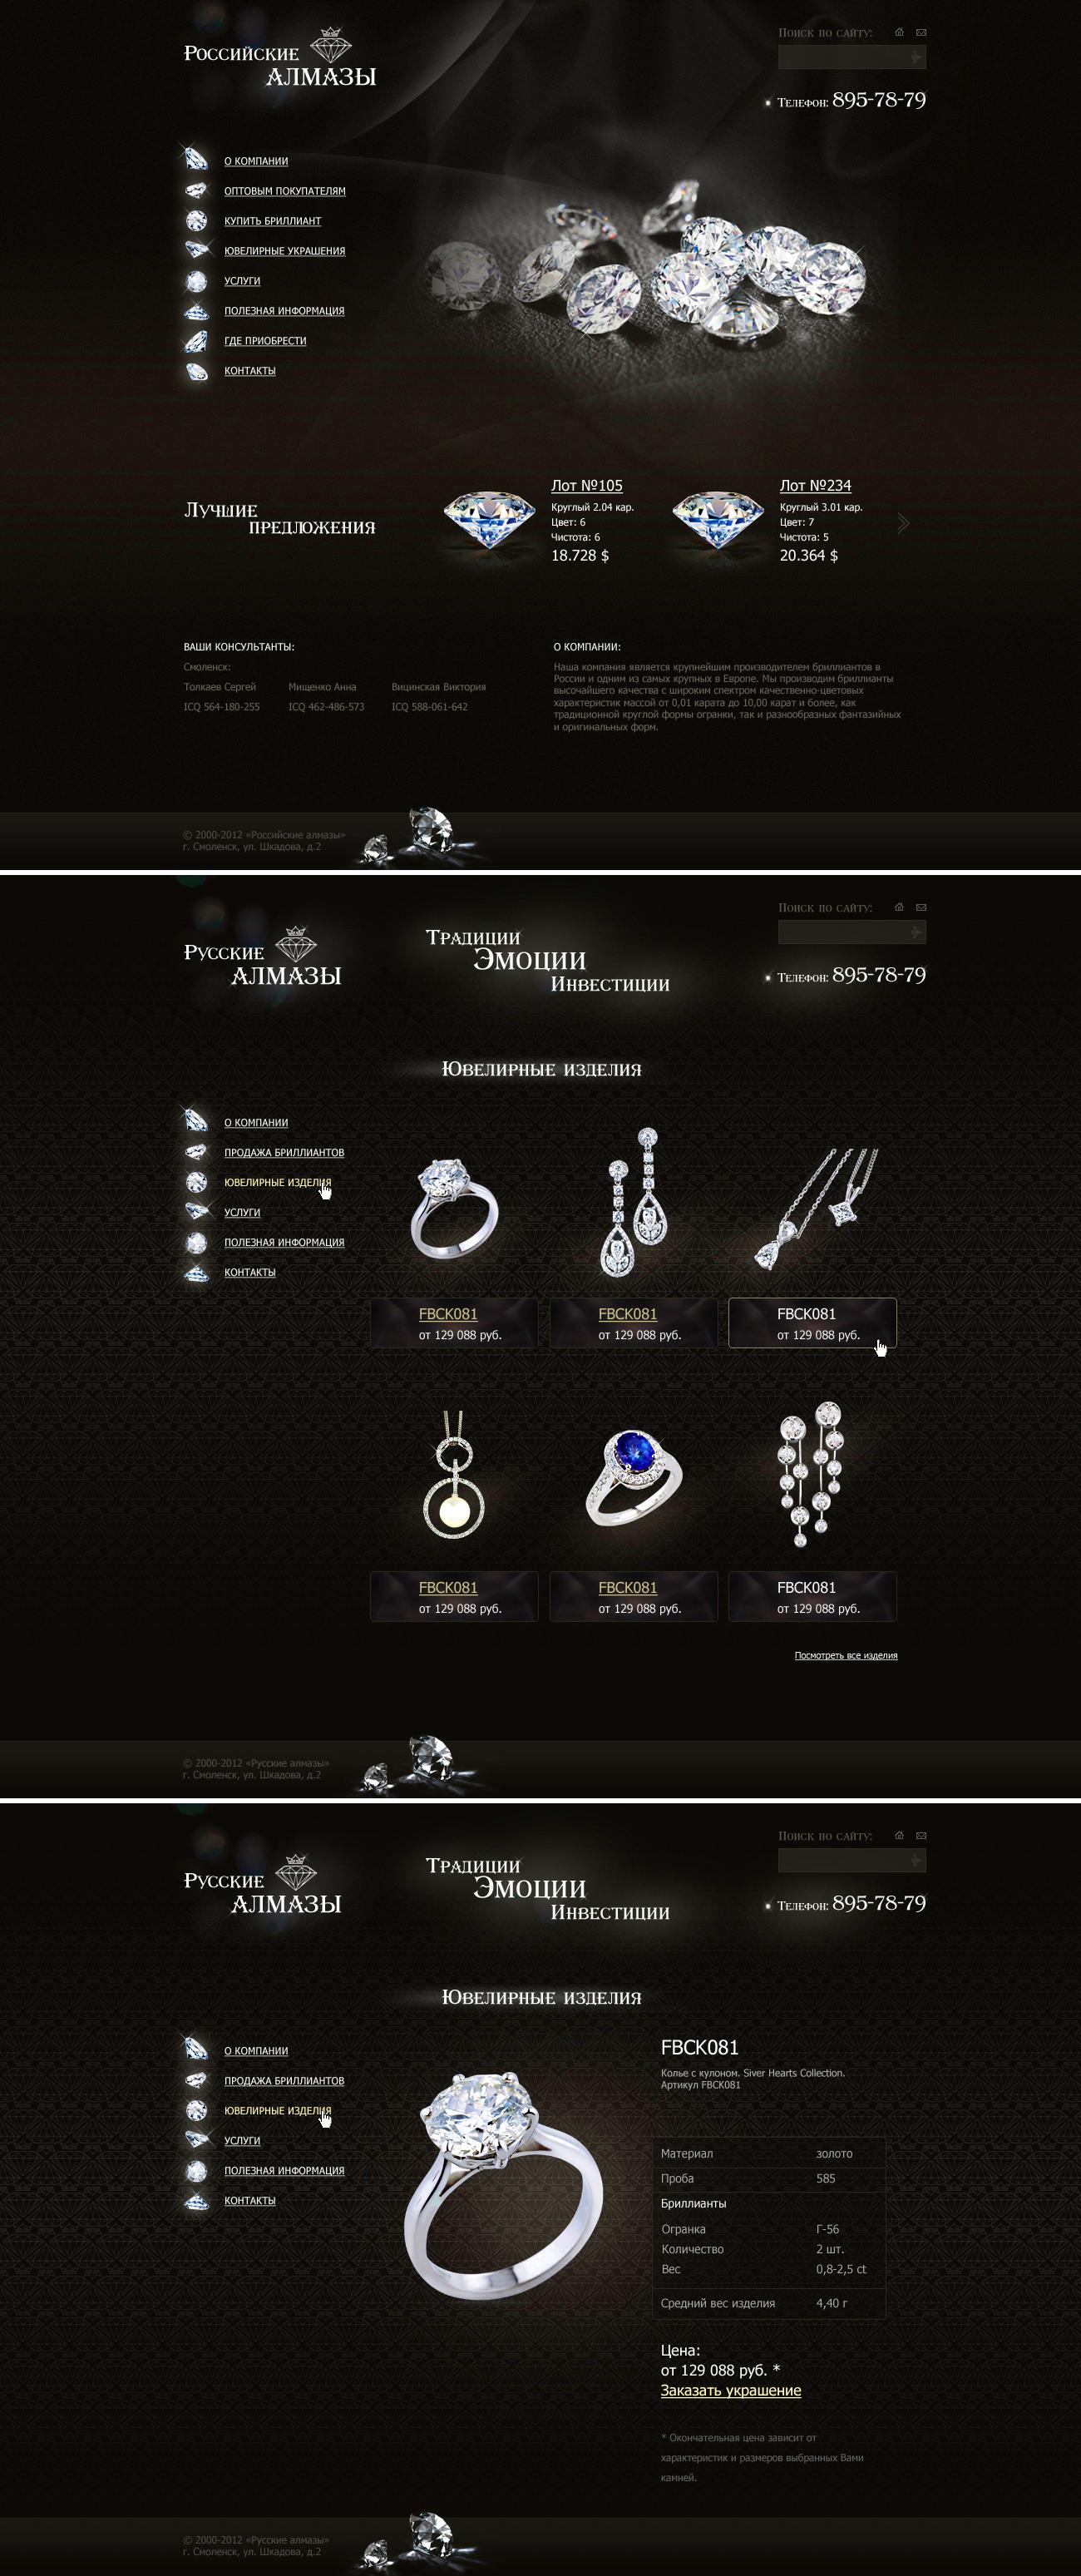 Русские алмазы